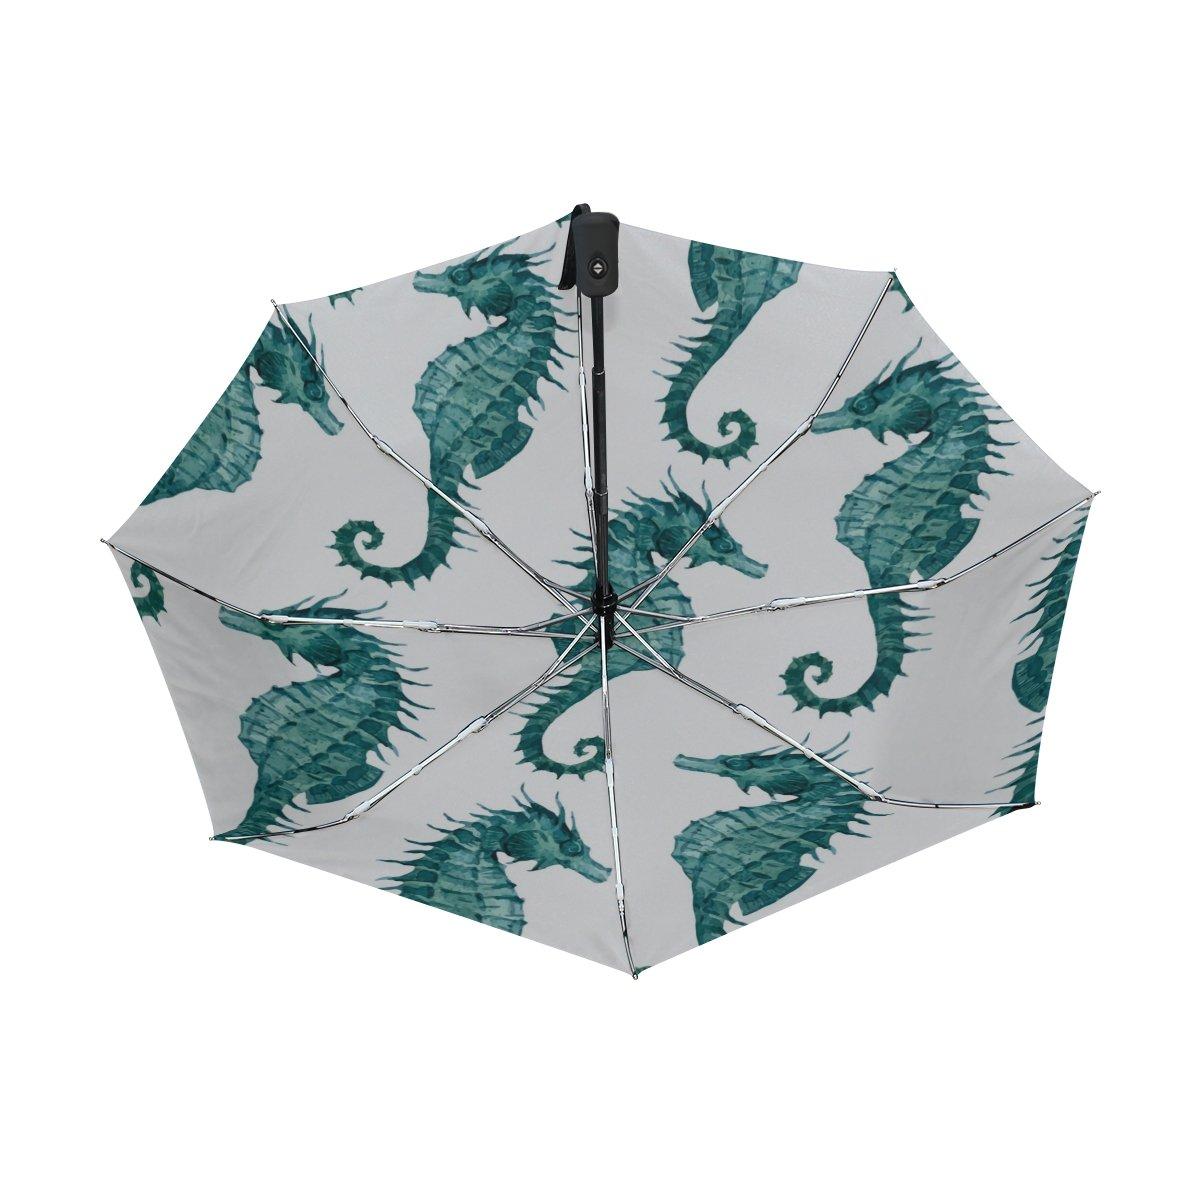 741e8ece9df2 Amazon.com: SUABO Windproof Automatic Travel Umbrella with ...